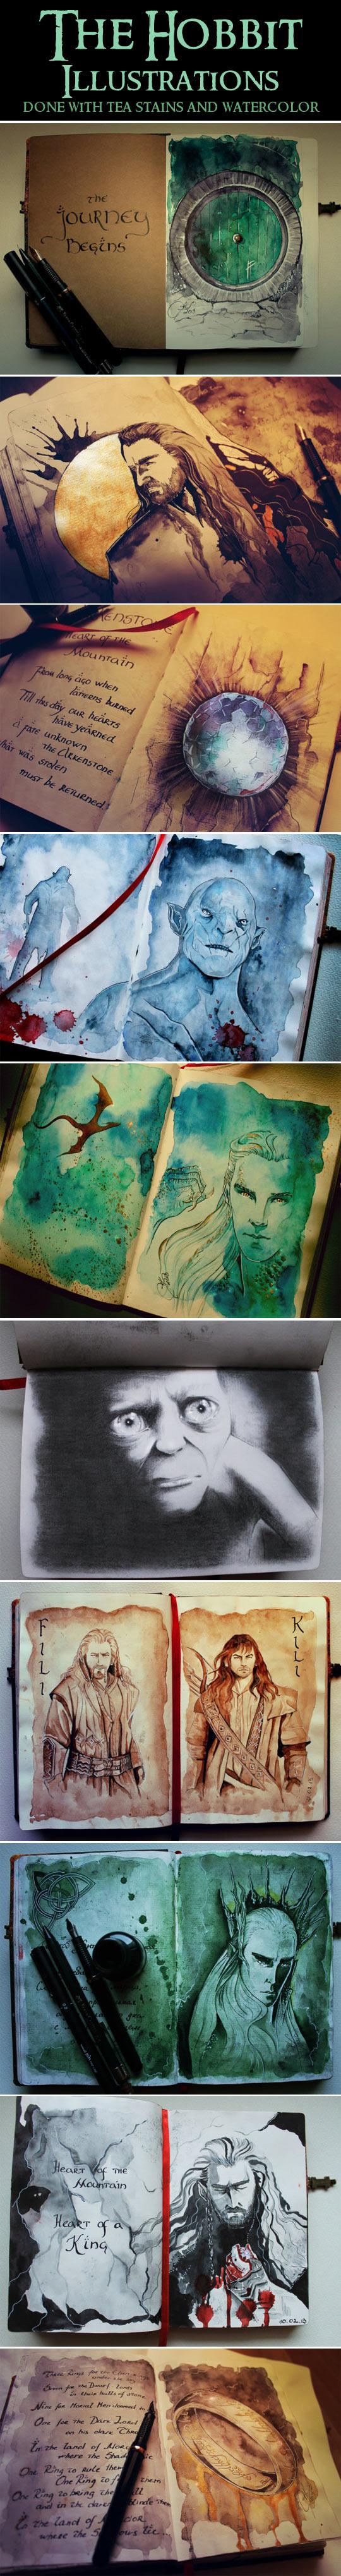 The Hobbit Illustrations.